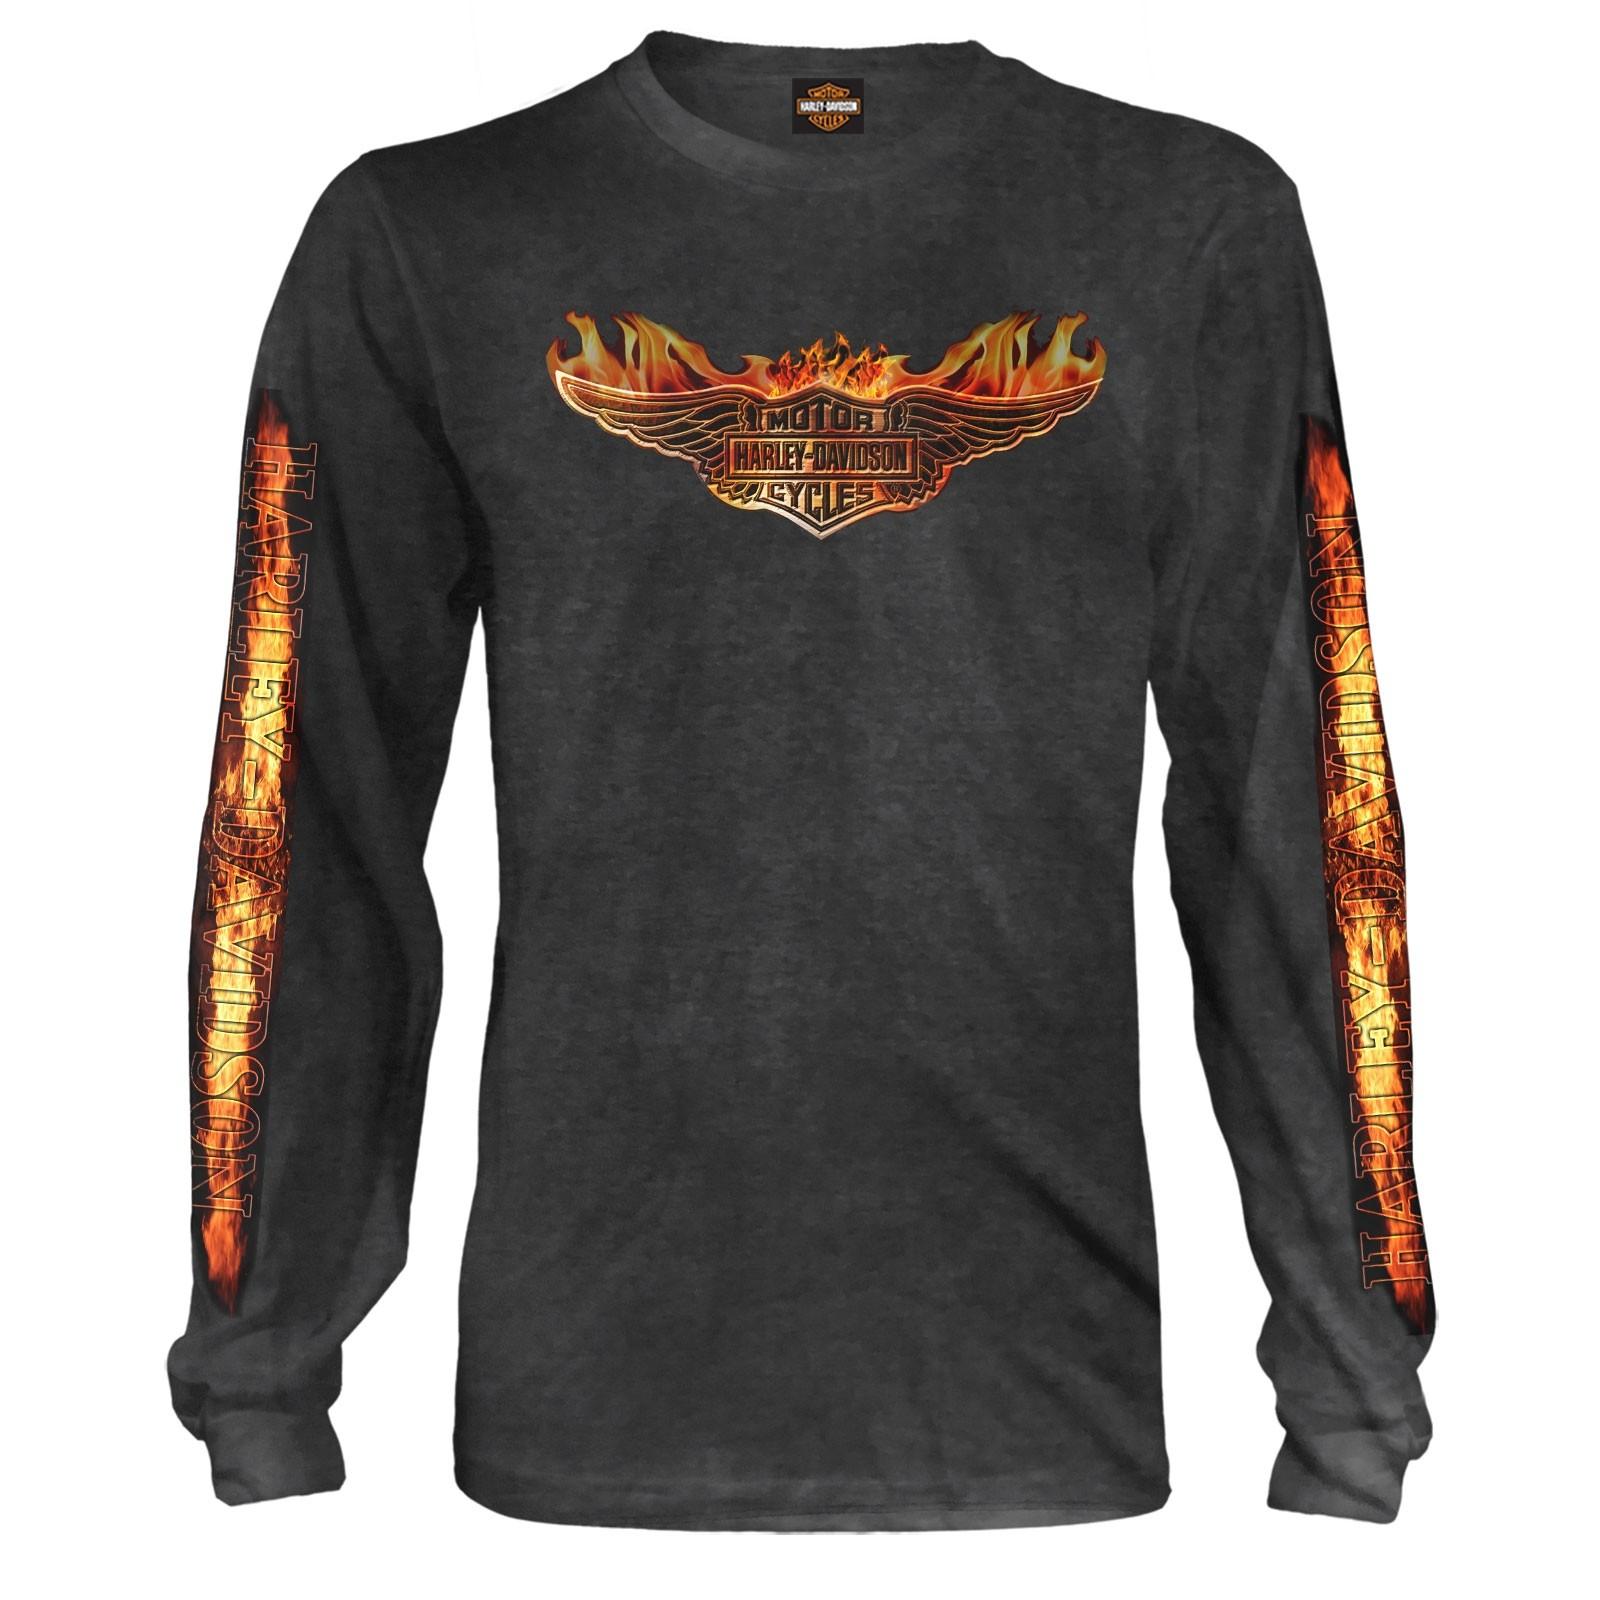 d7da67c03 Harley-Davidson Men's Long-Sleeve Graphic Tee - Bagram Air Base   Burning